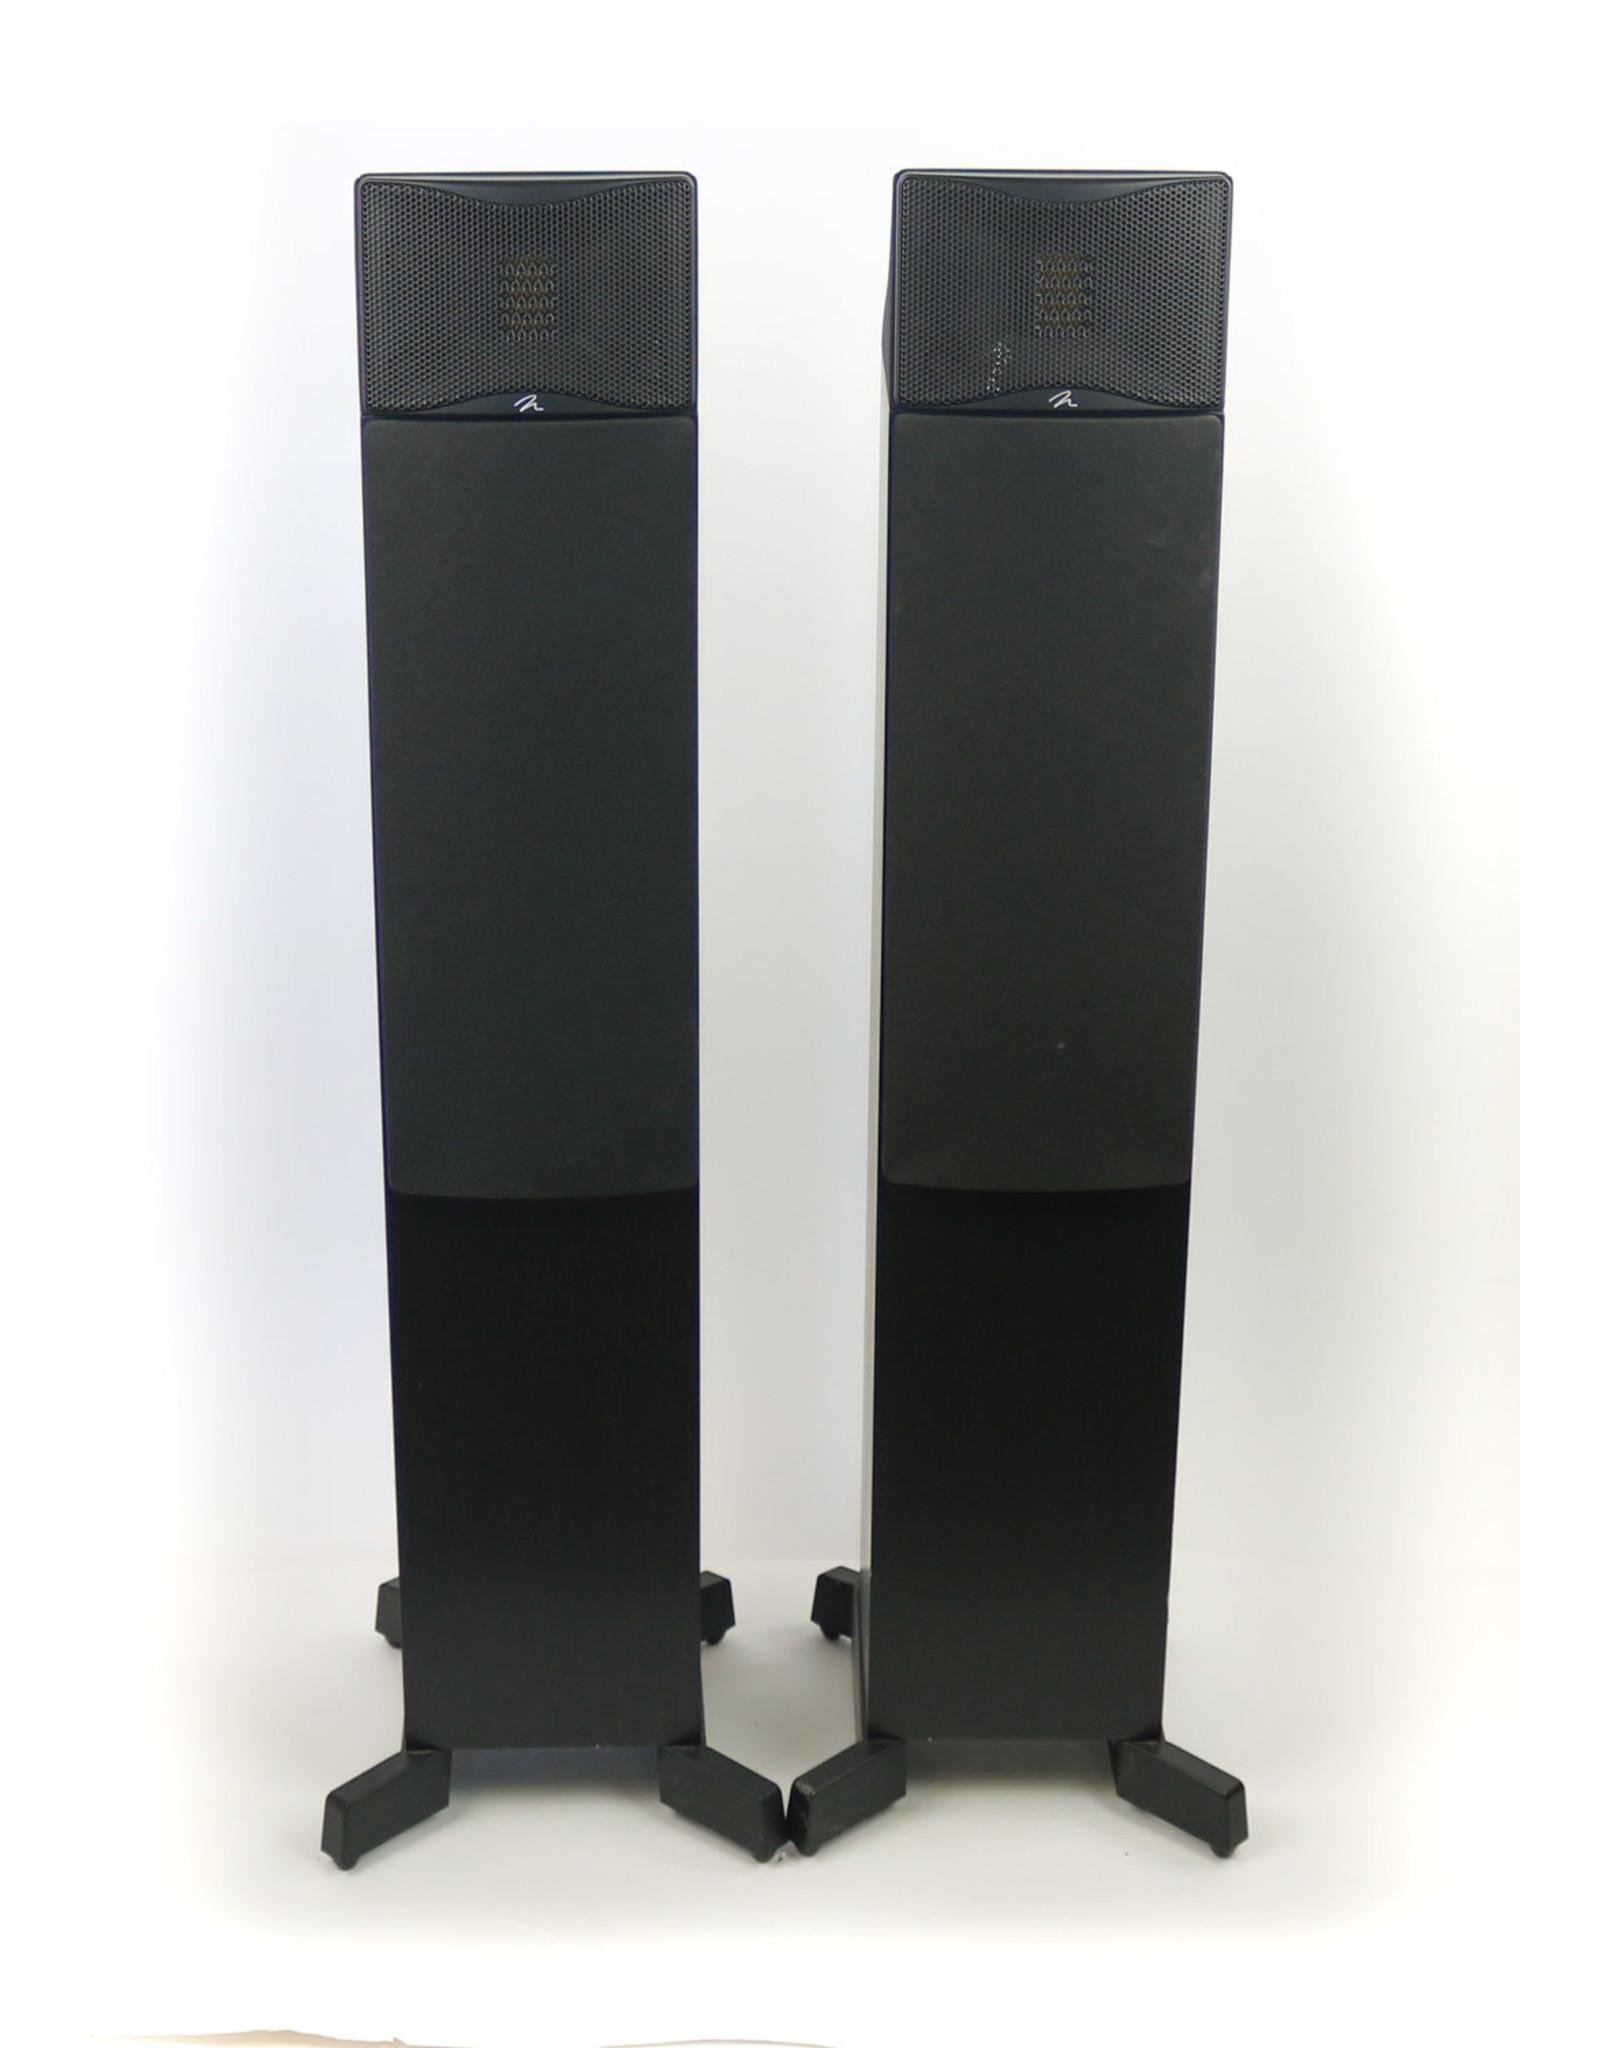 MartinLogan MartinLogan Motion 10 Floorstanding Speakers USED